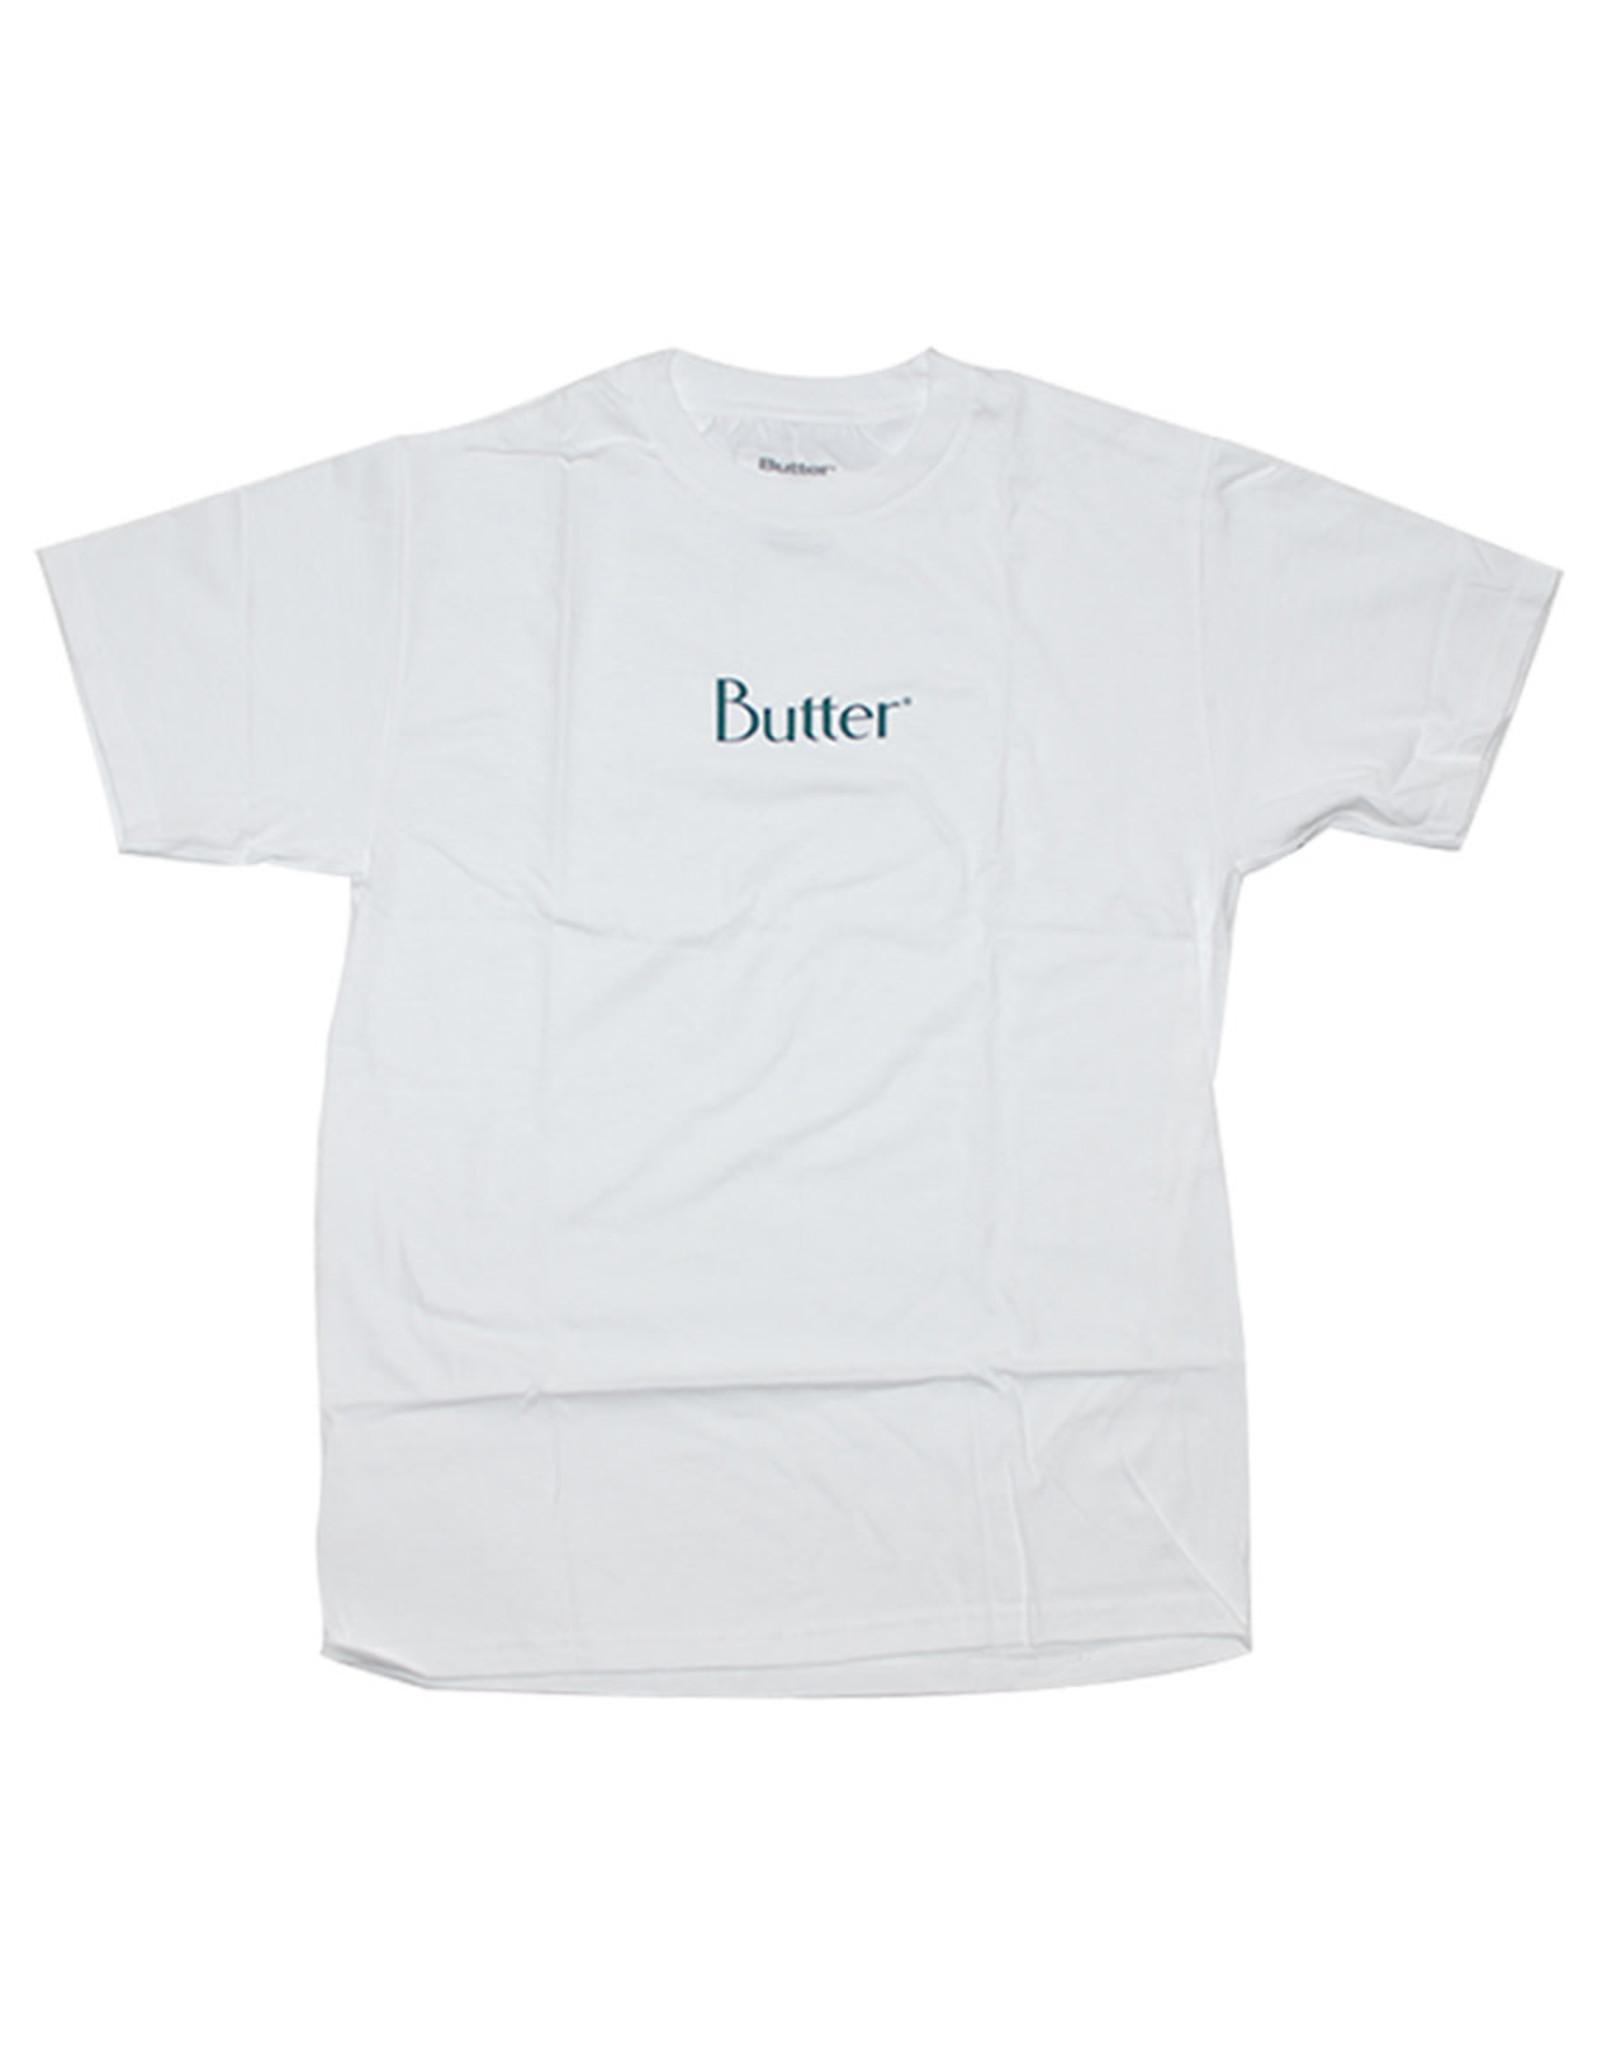 Butter Goods Butter Goods Tee Classic Logo S/S (White)